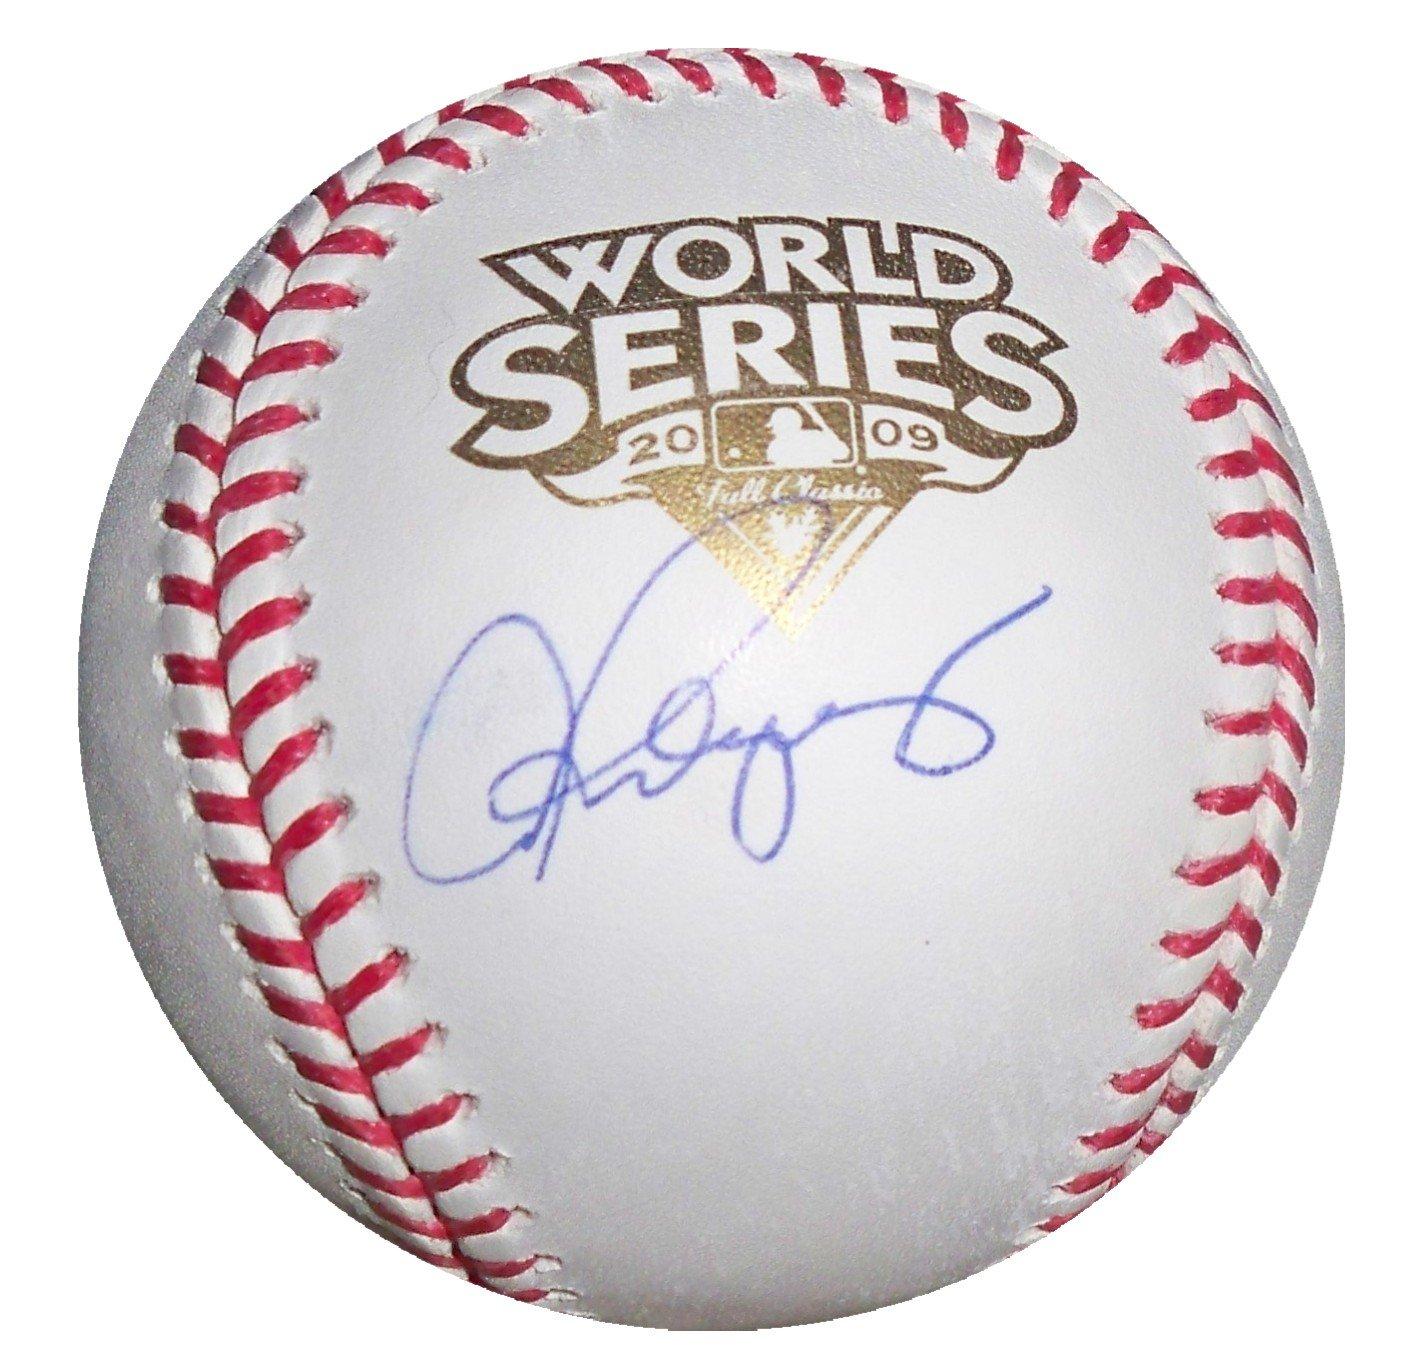 Alex Rodriguez Signed 2009 World Series Baseball (MLB Authenticated)